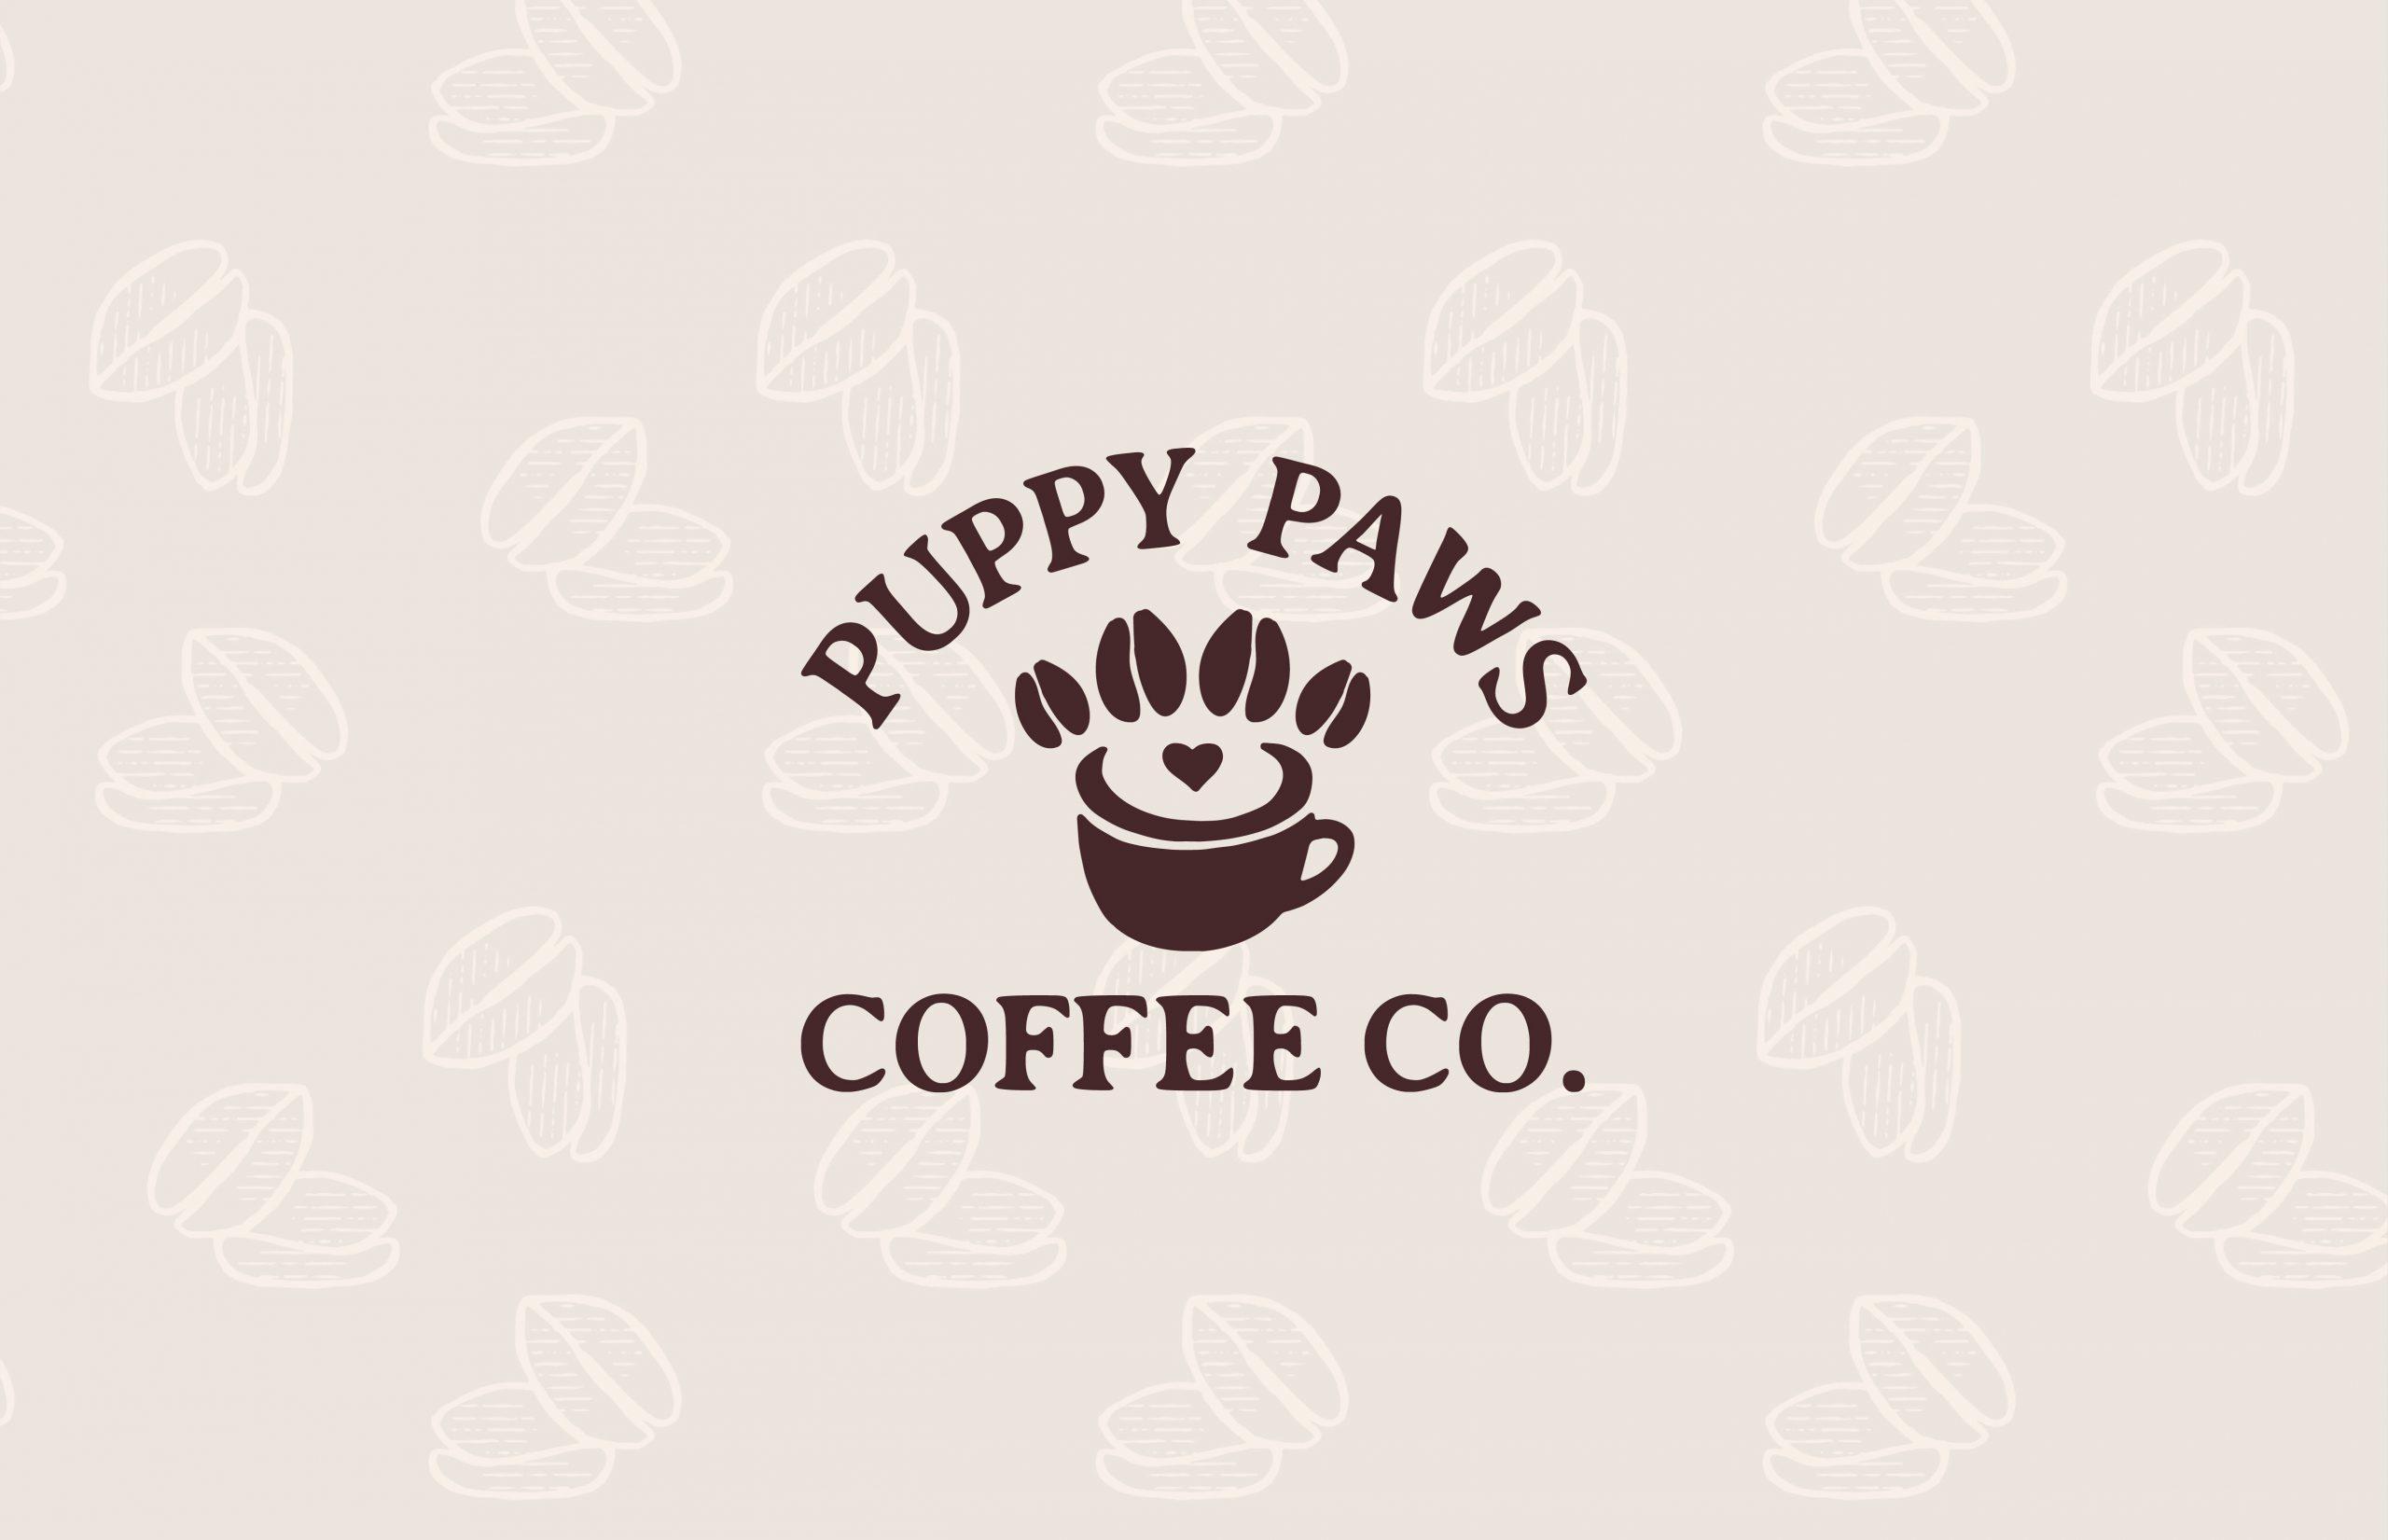 Puppy Paws coffee mug logo